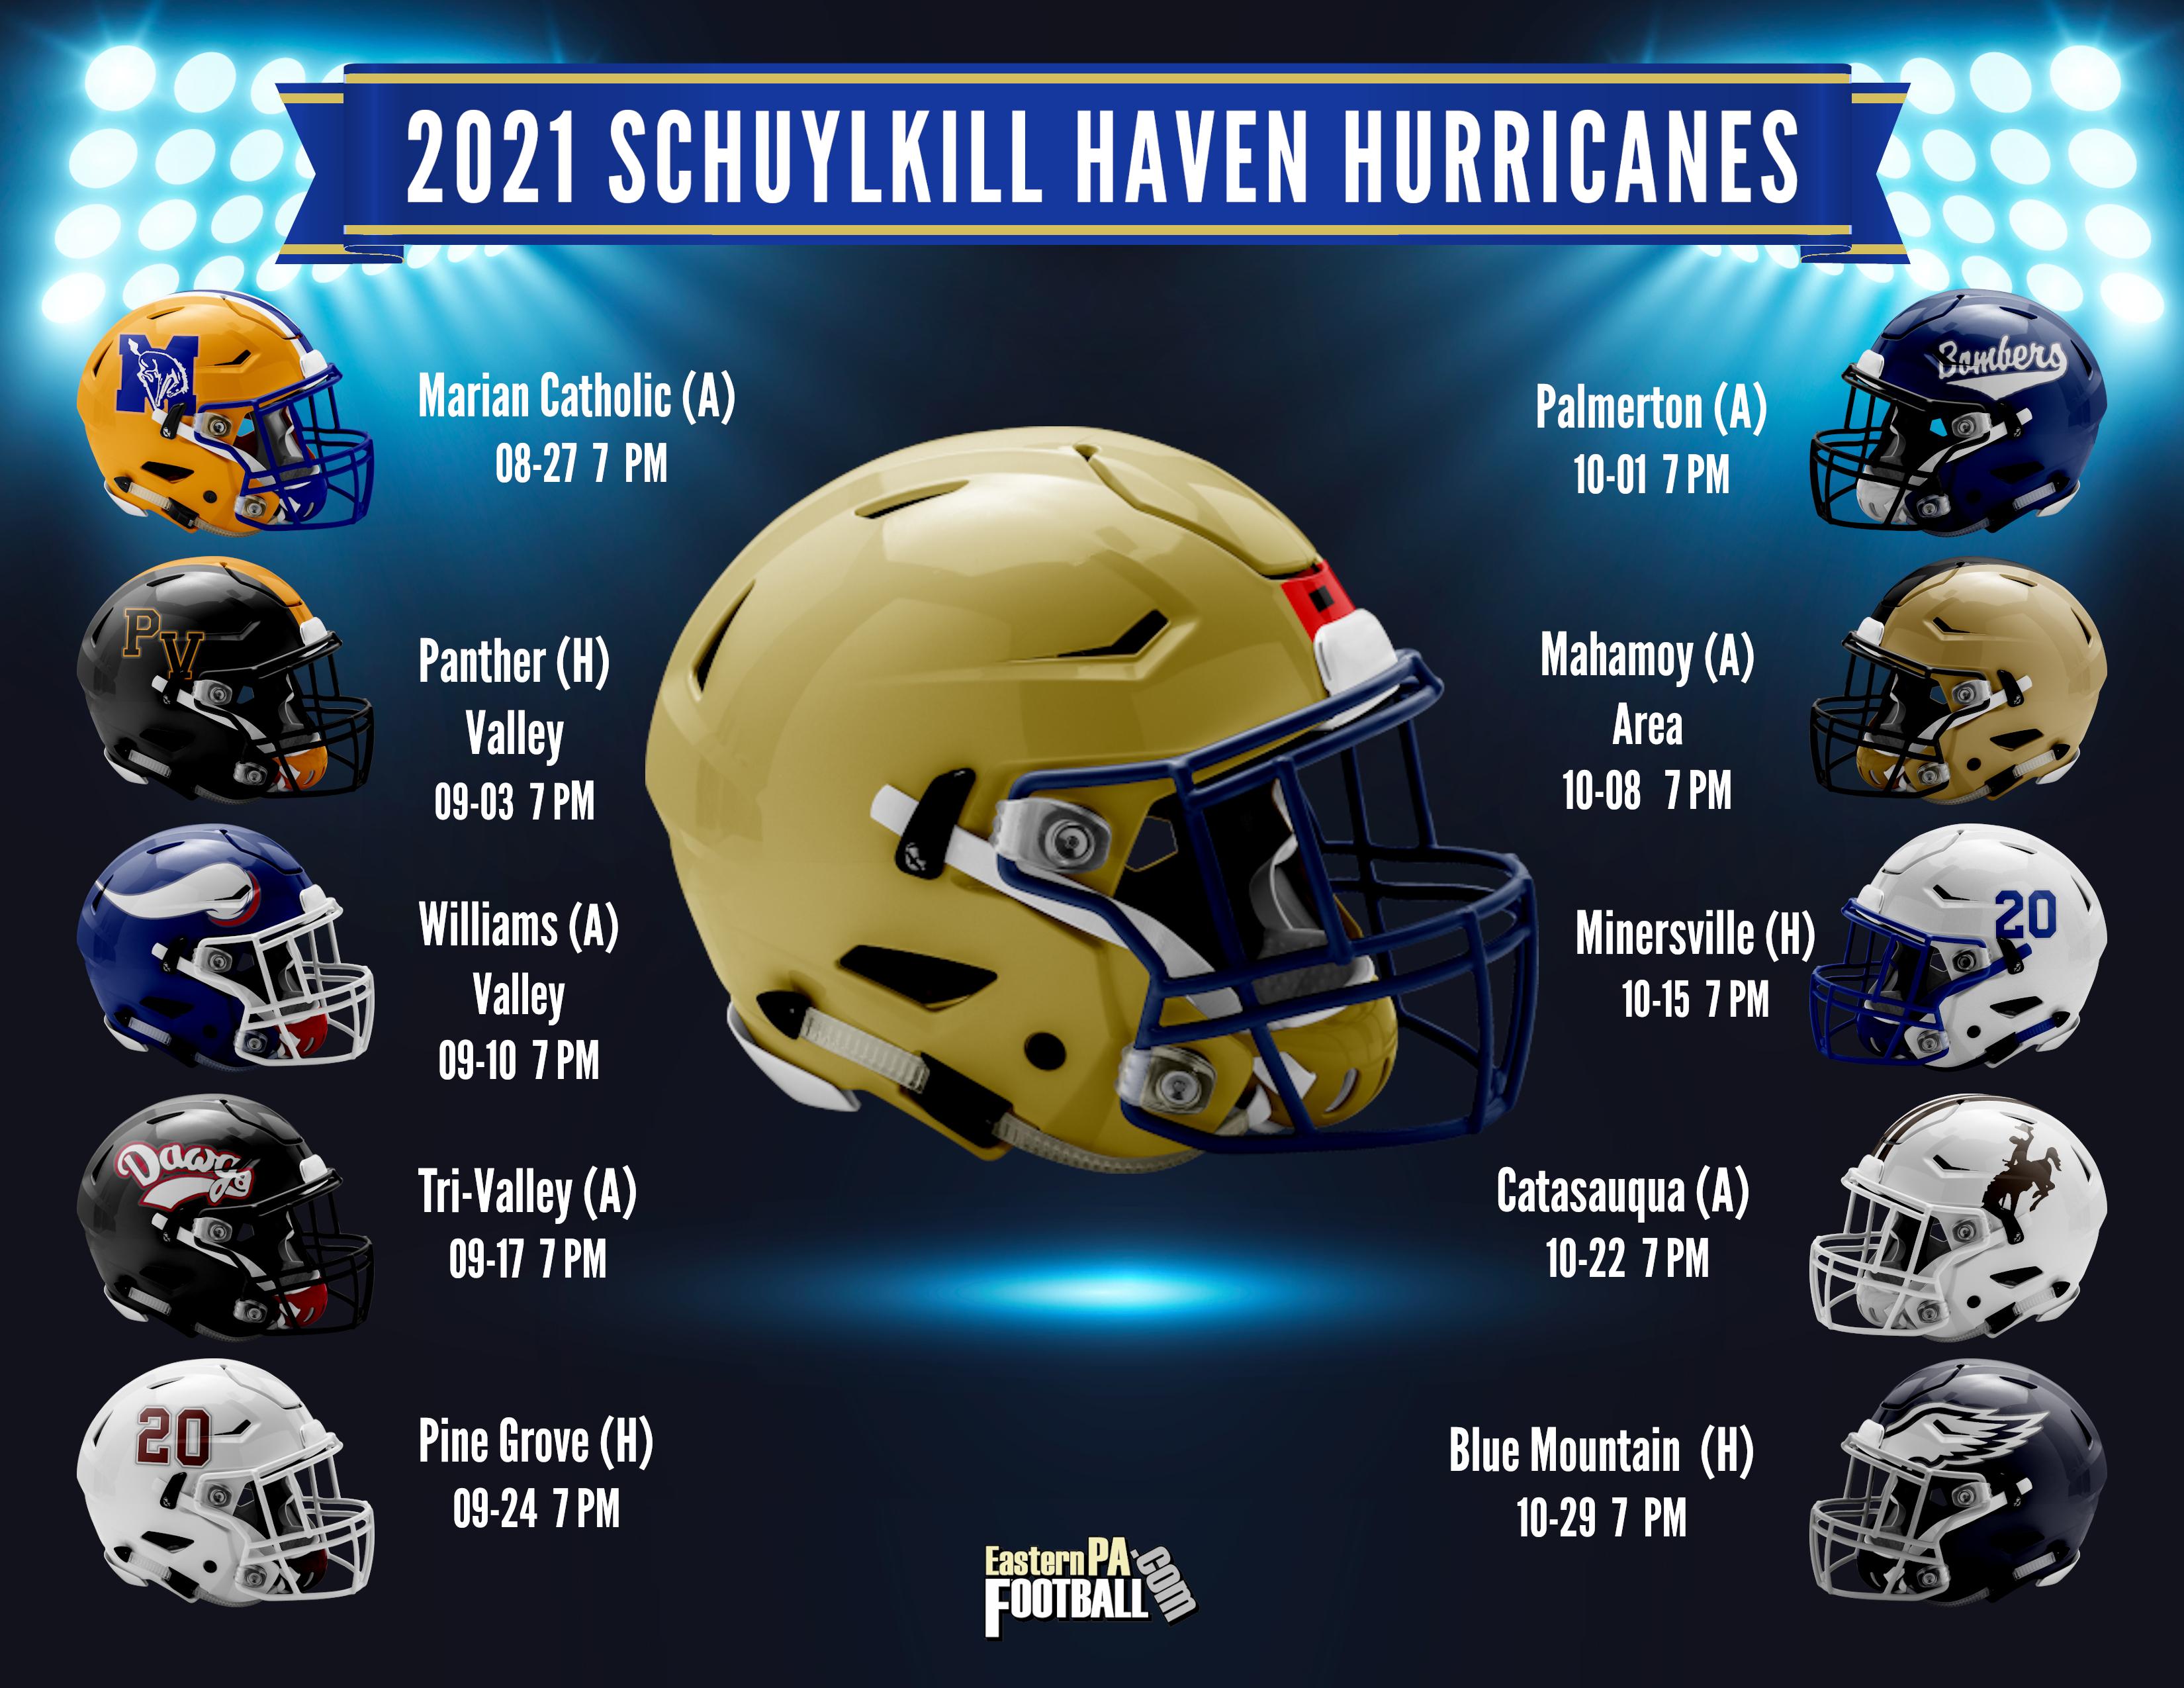 2021 Schuylkill Haven Hurricanes - Varsity Football Schedule